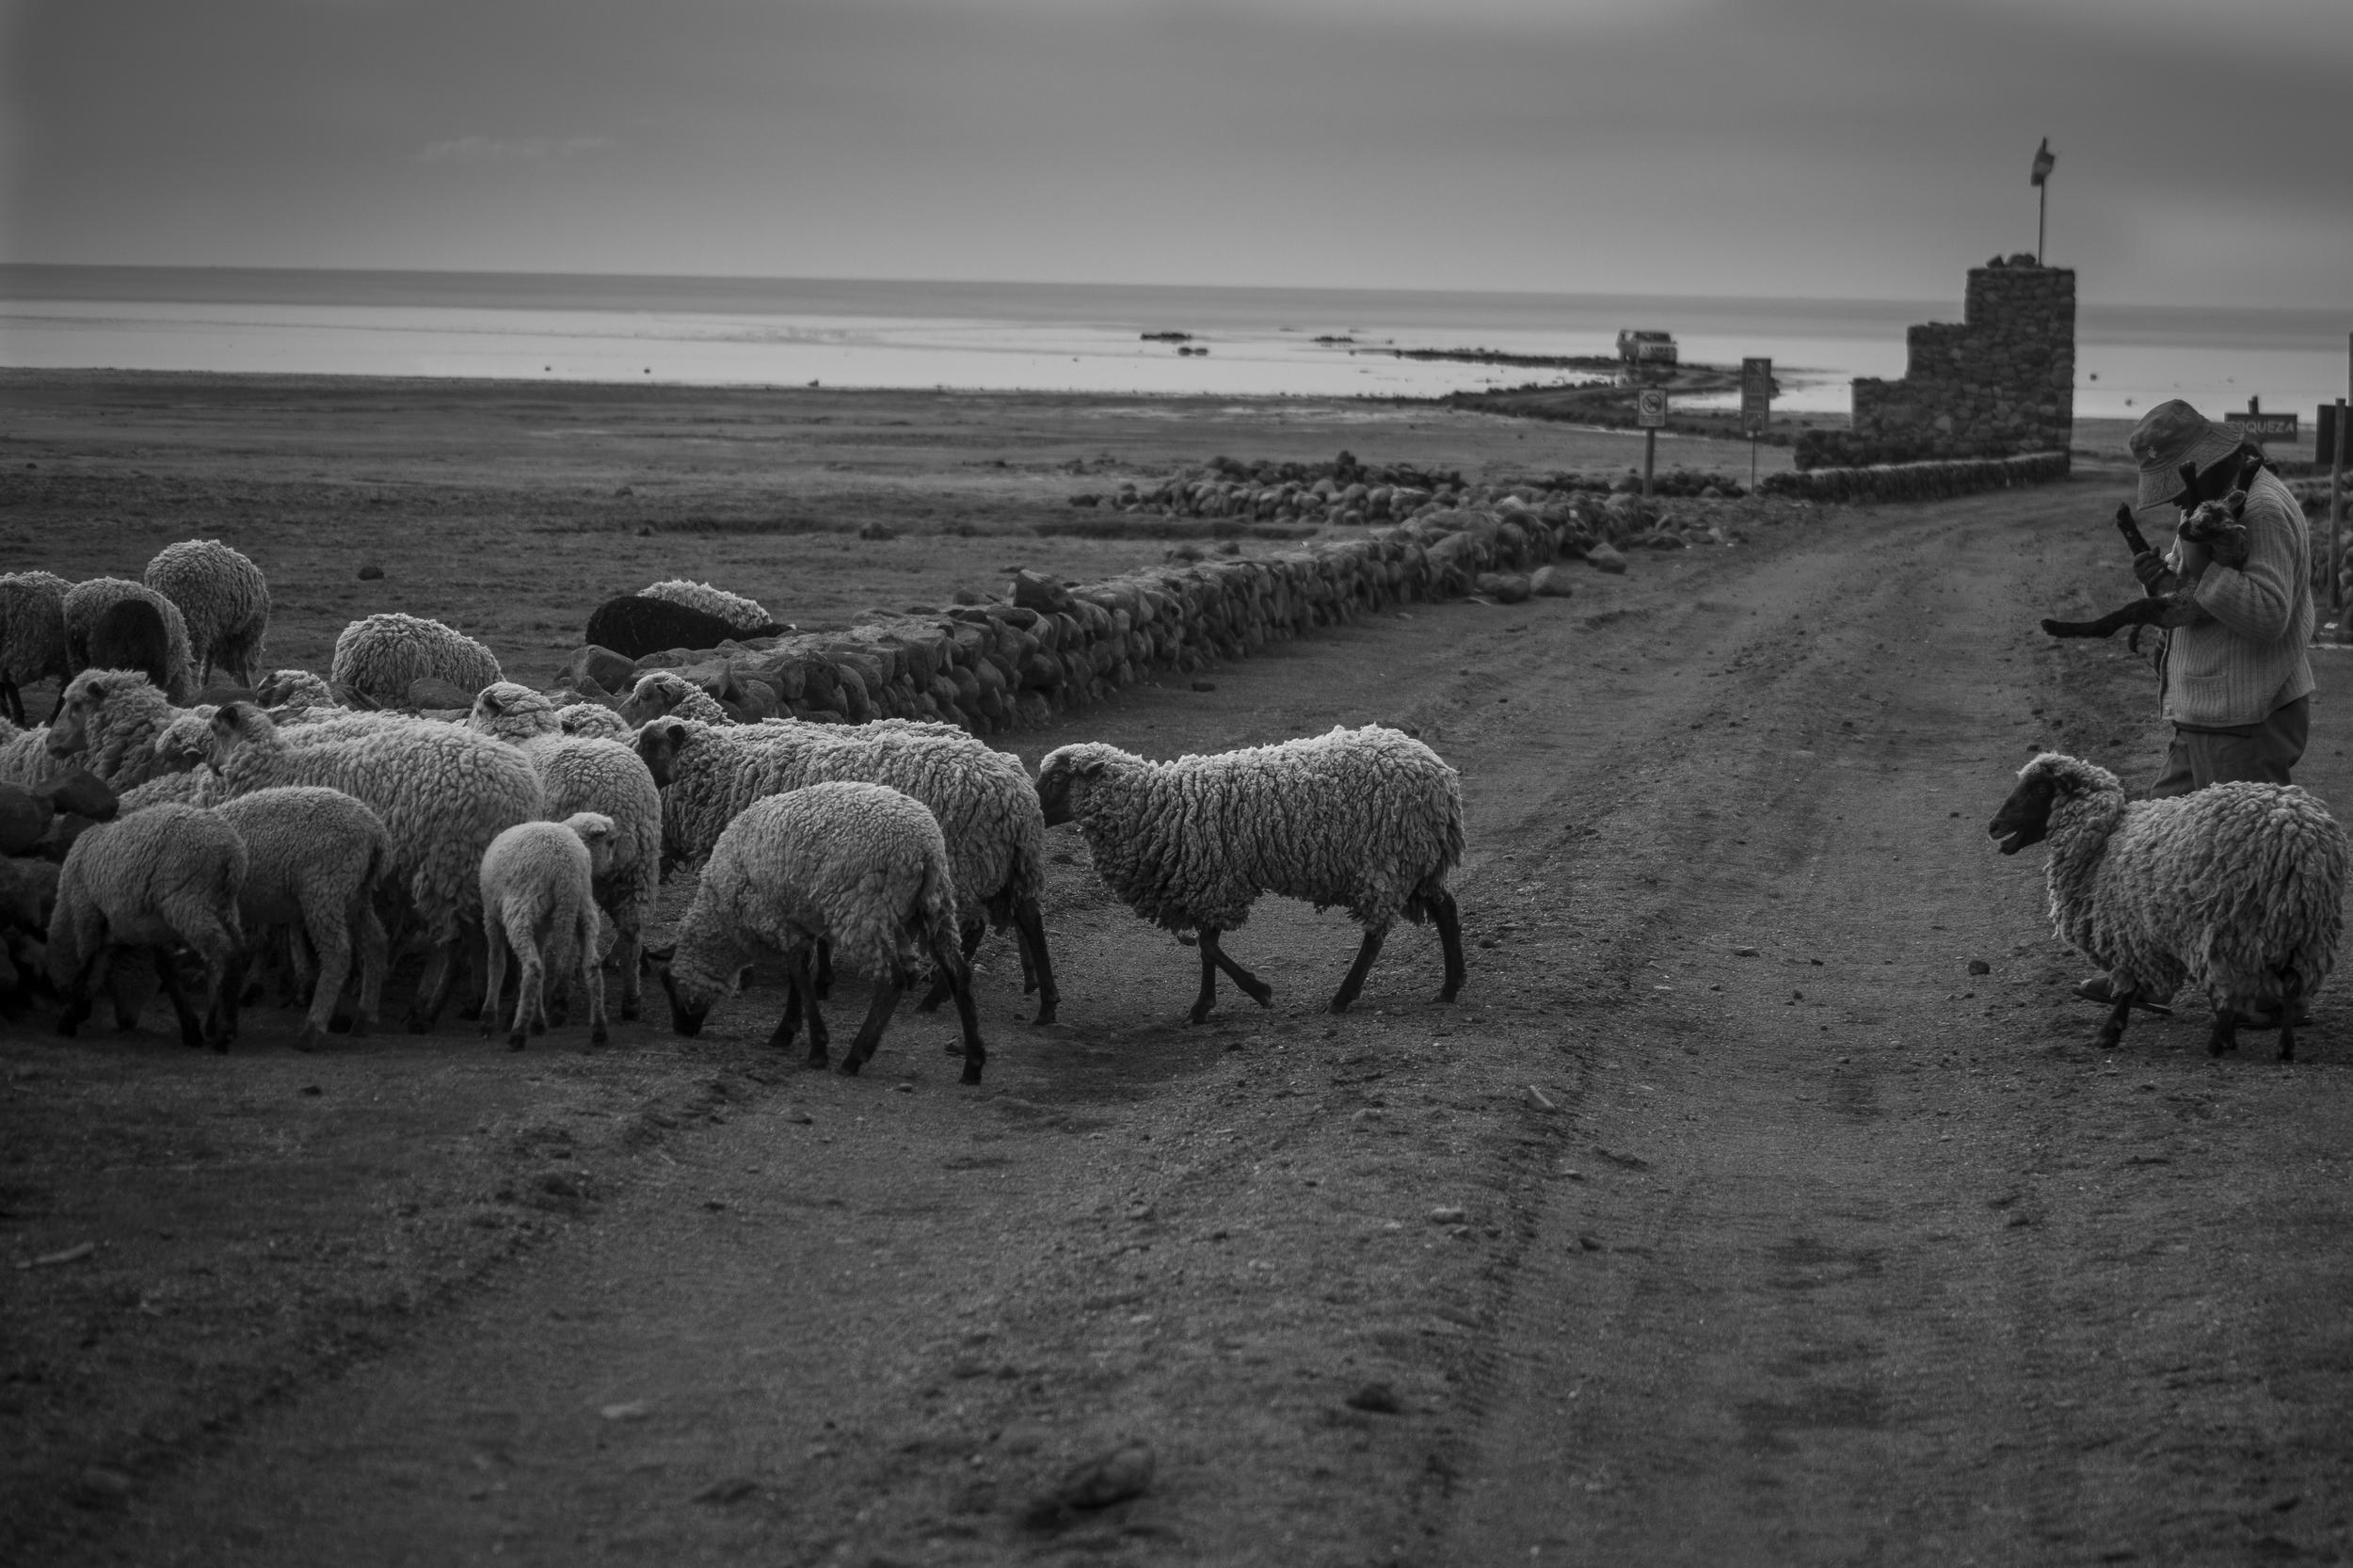 bol sheep herder with baby sheep bw 4x6.jpg